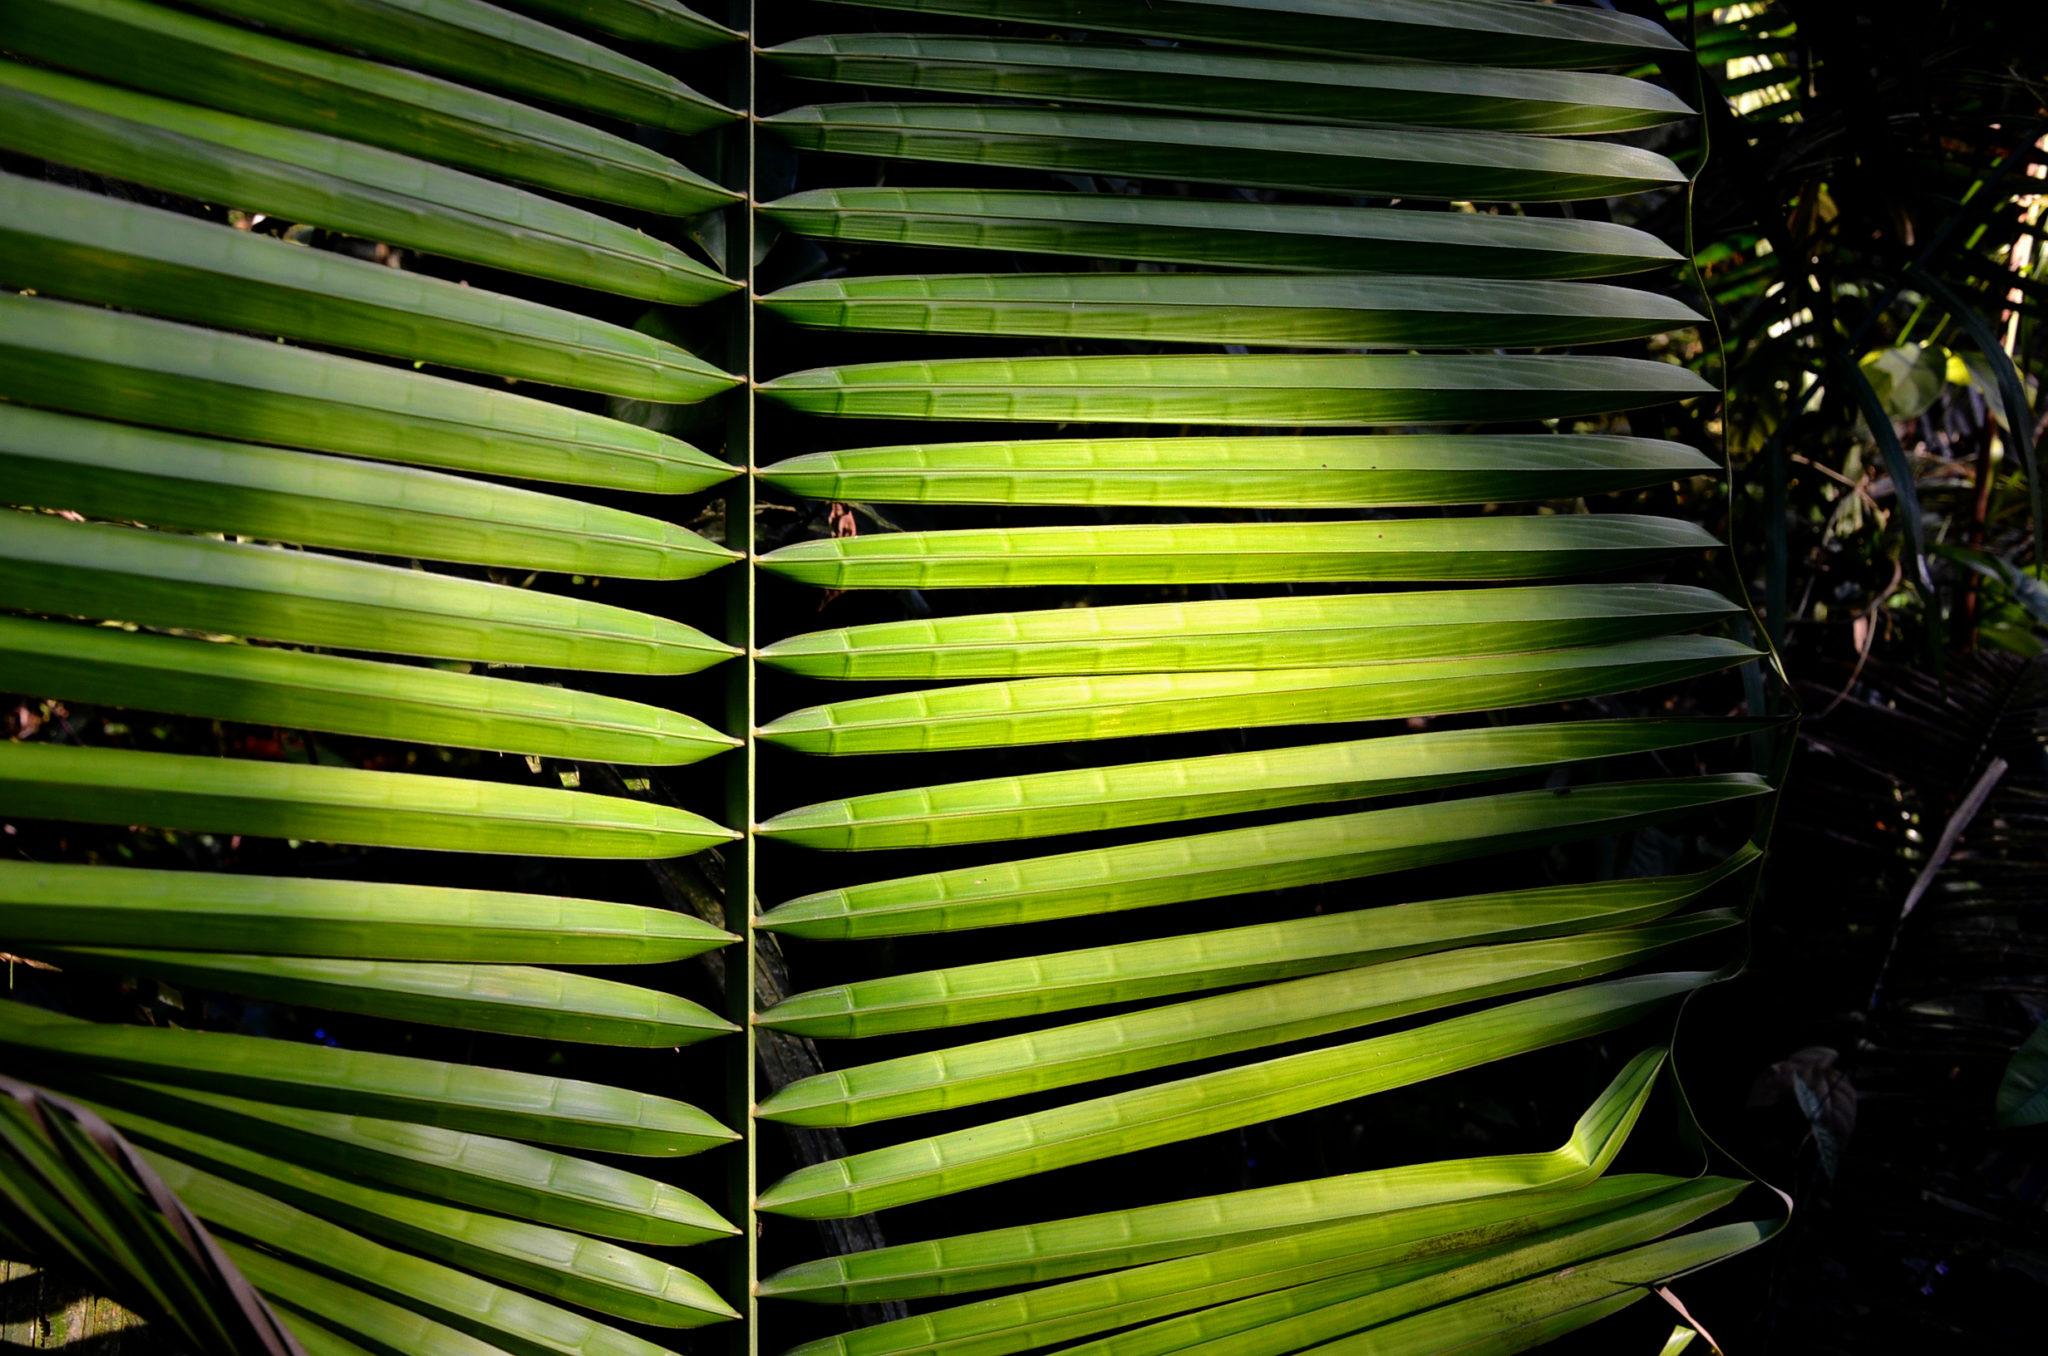 ecuador-piranha-fish-palmtree